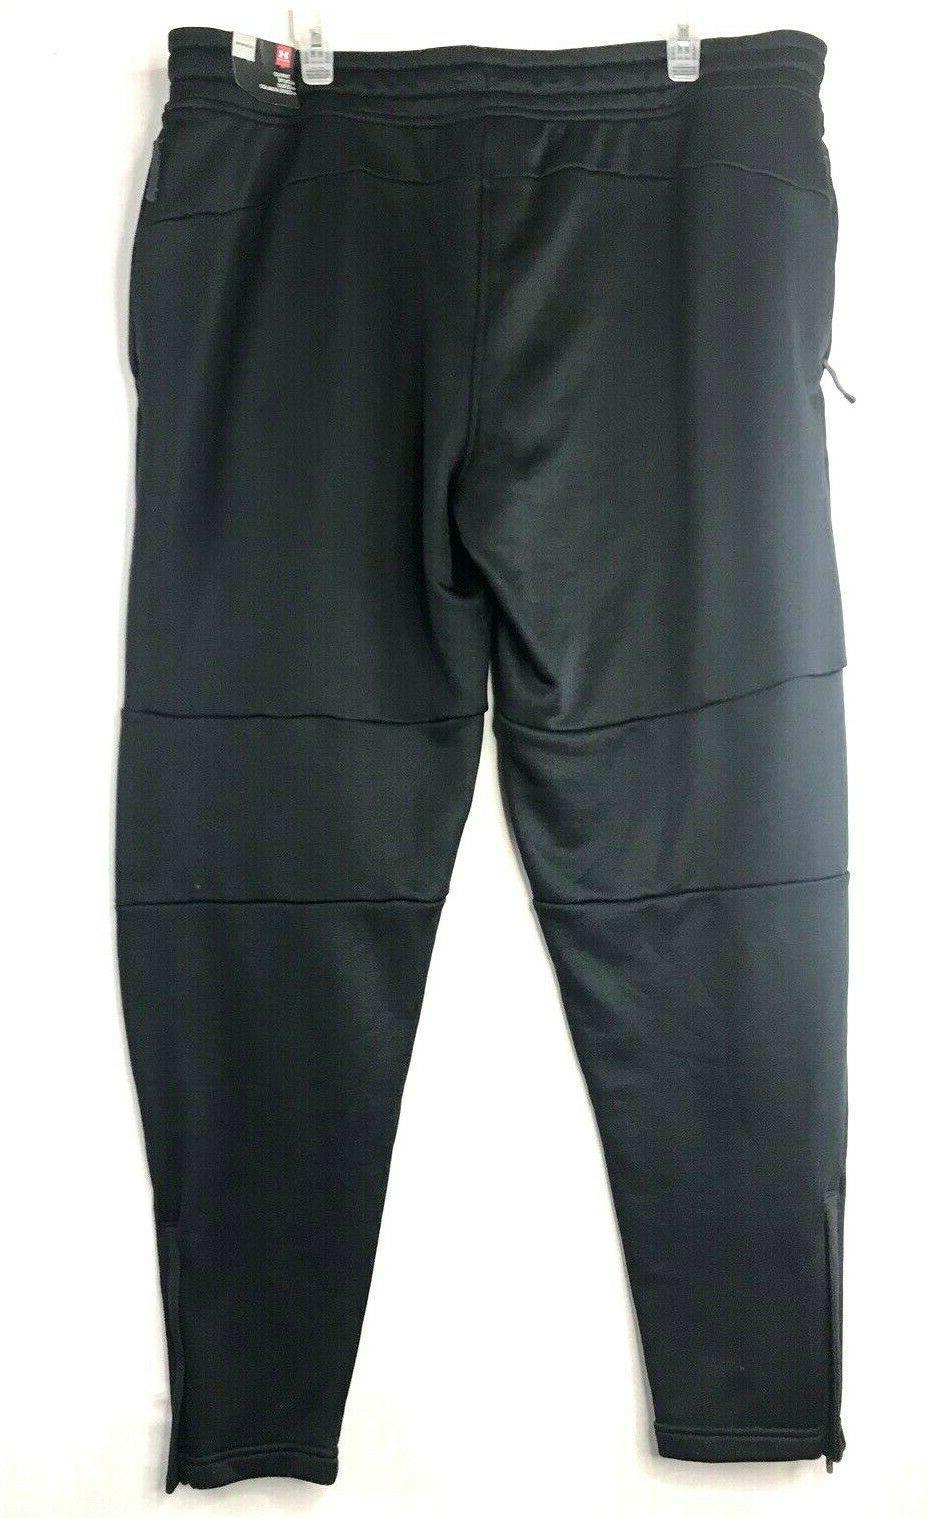 NWT Mens Sweatpants Joggers Gear